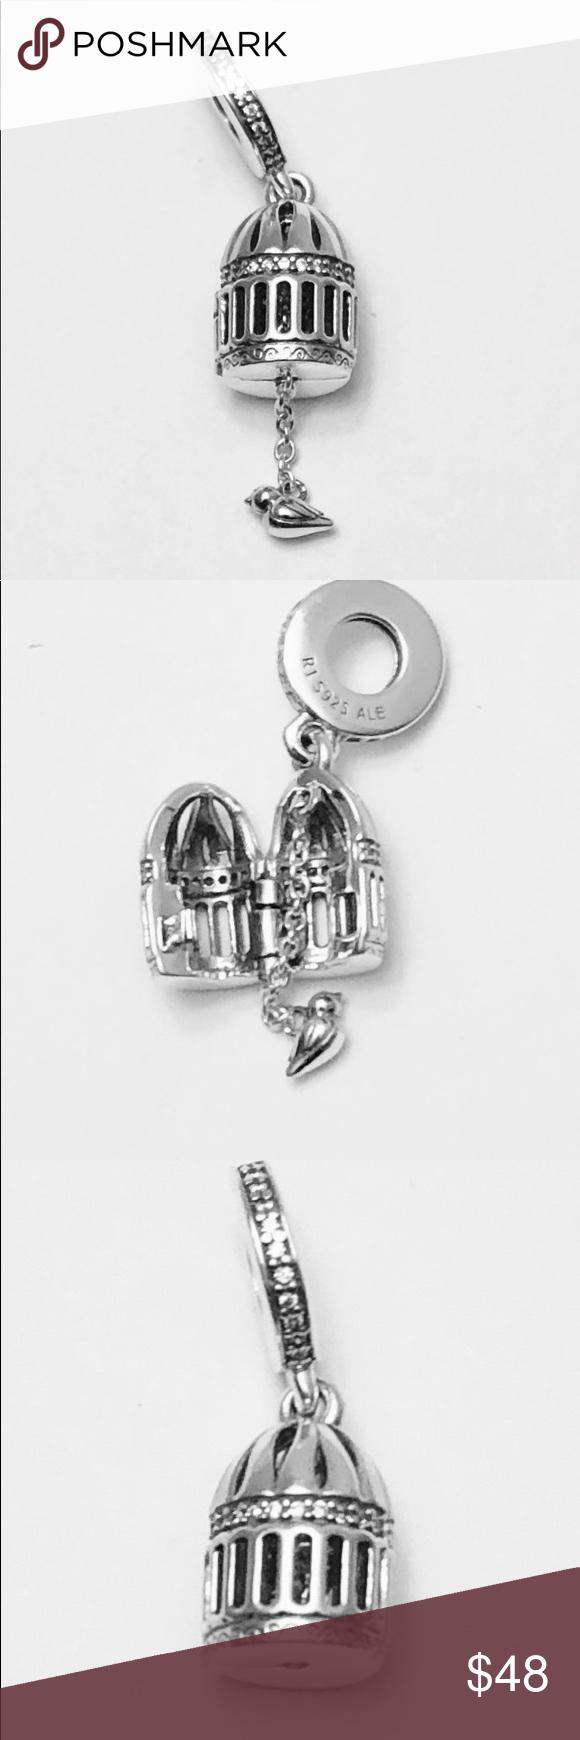 Authentic Pandora Free As A Bird Charm Bird Charm Pandora Free Pandora Jewelry